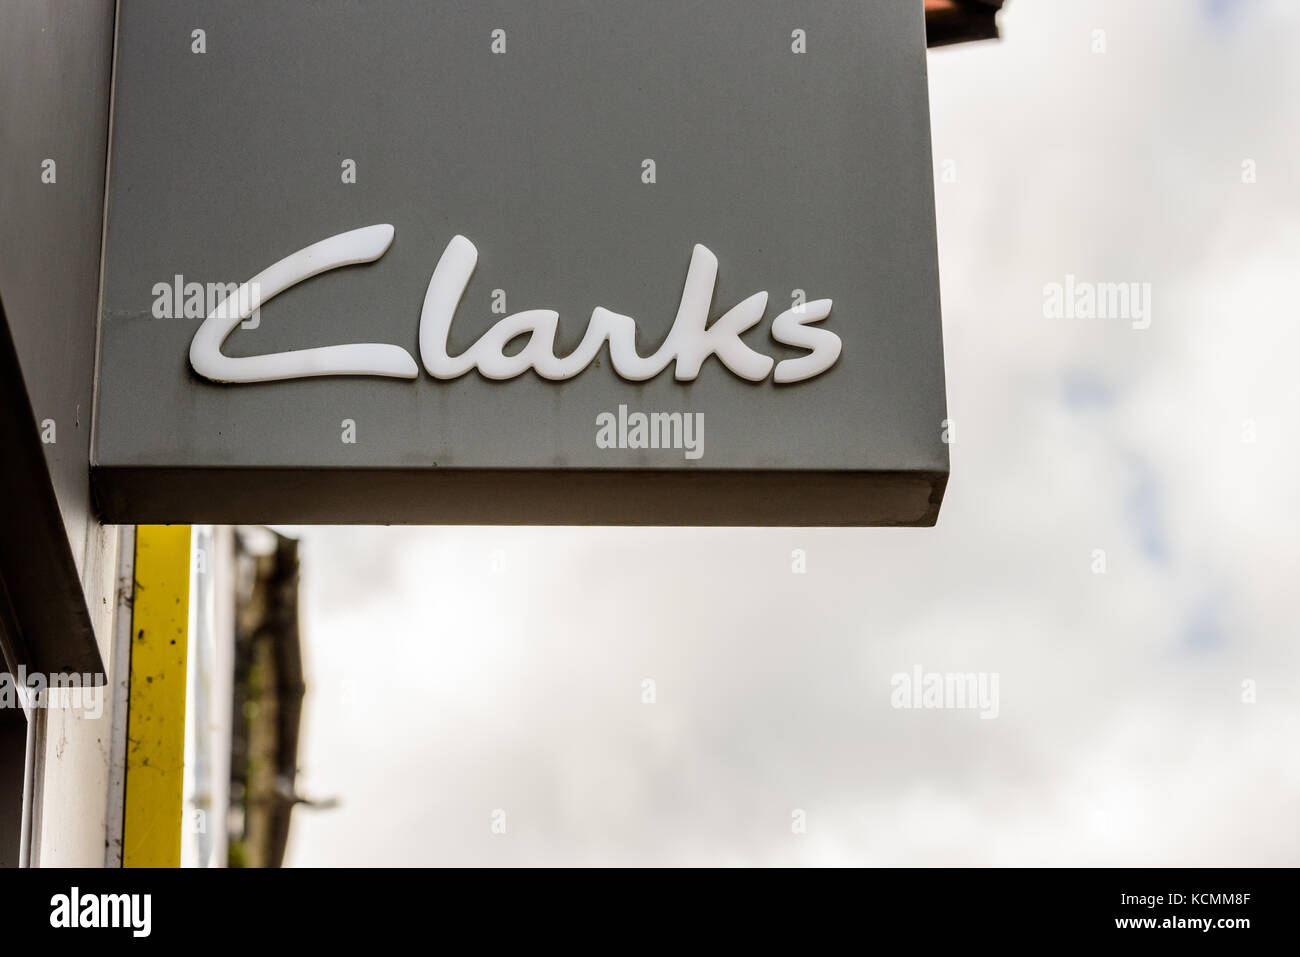 Clarks Shoes Earls Barton